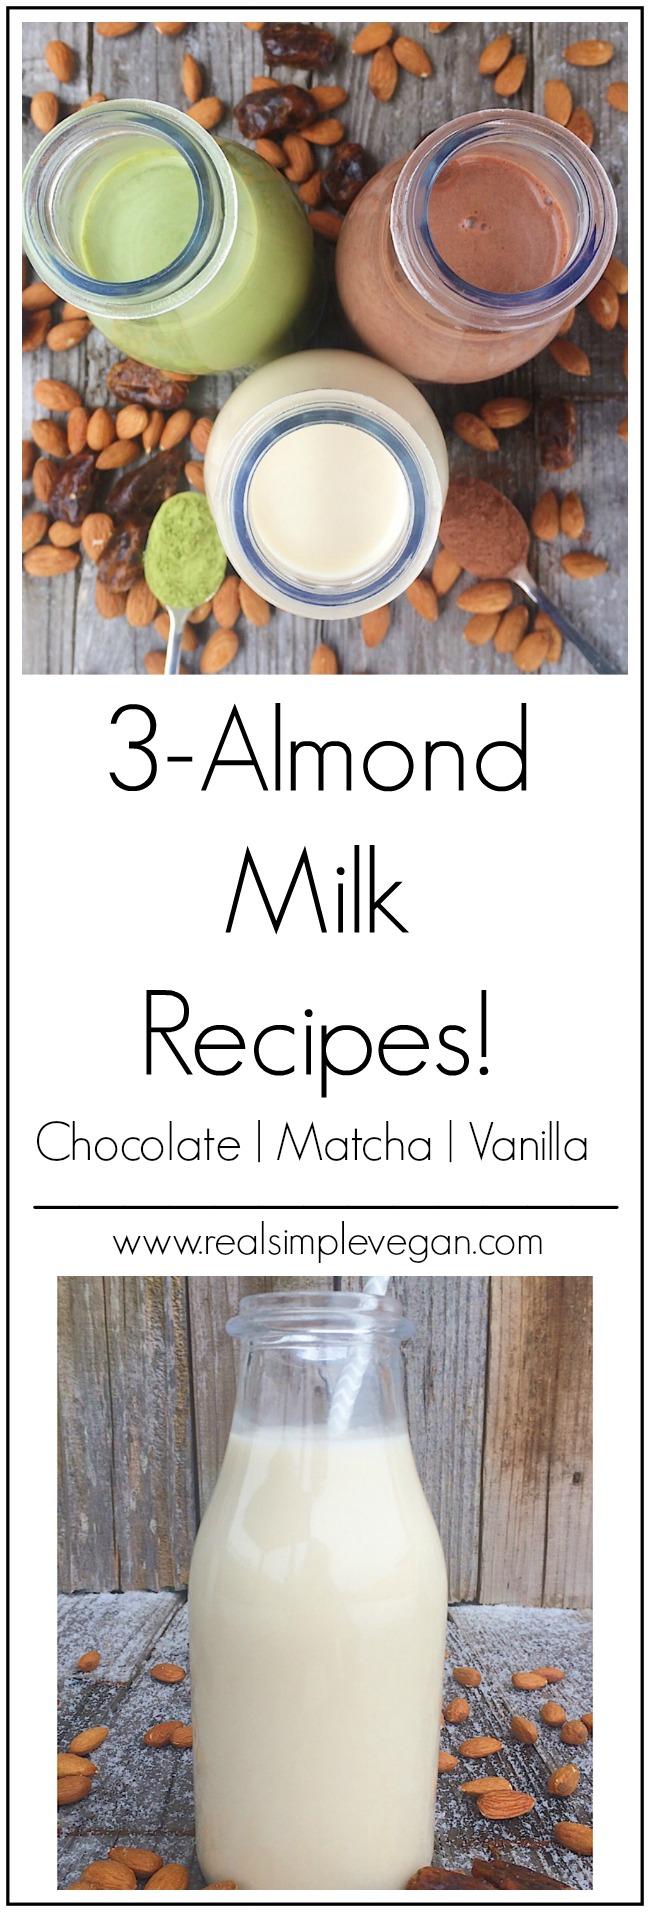 3 Way Almond Milk | Real. Simple. Vegan.